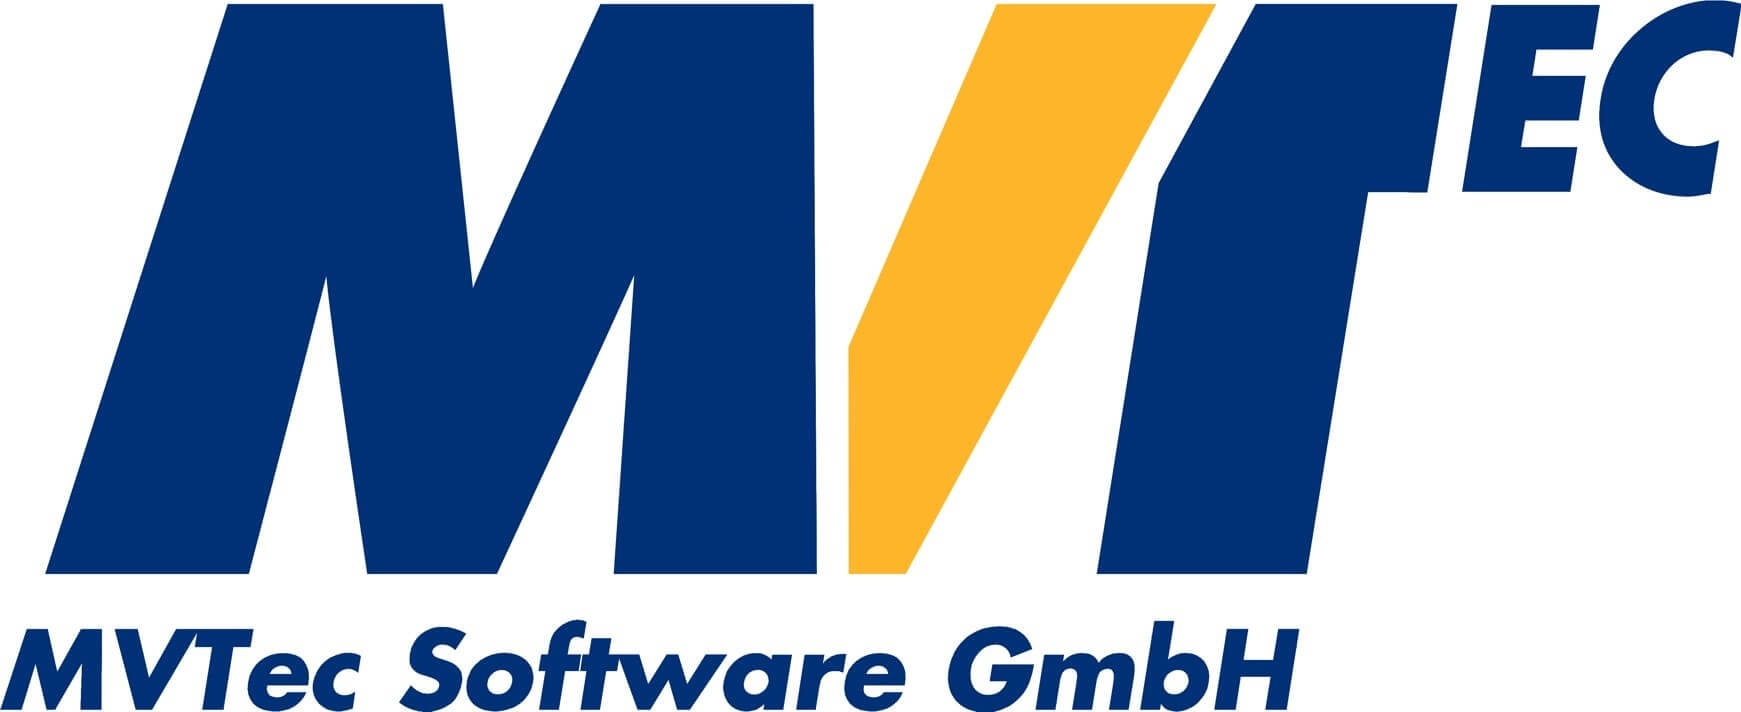 MVTec Software GmbH